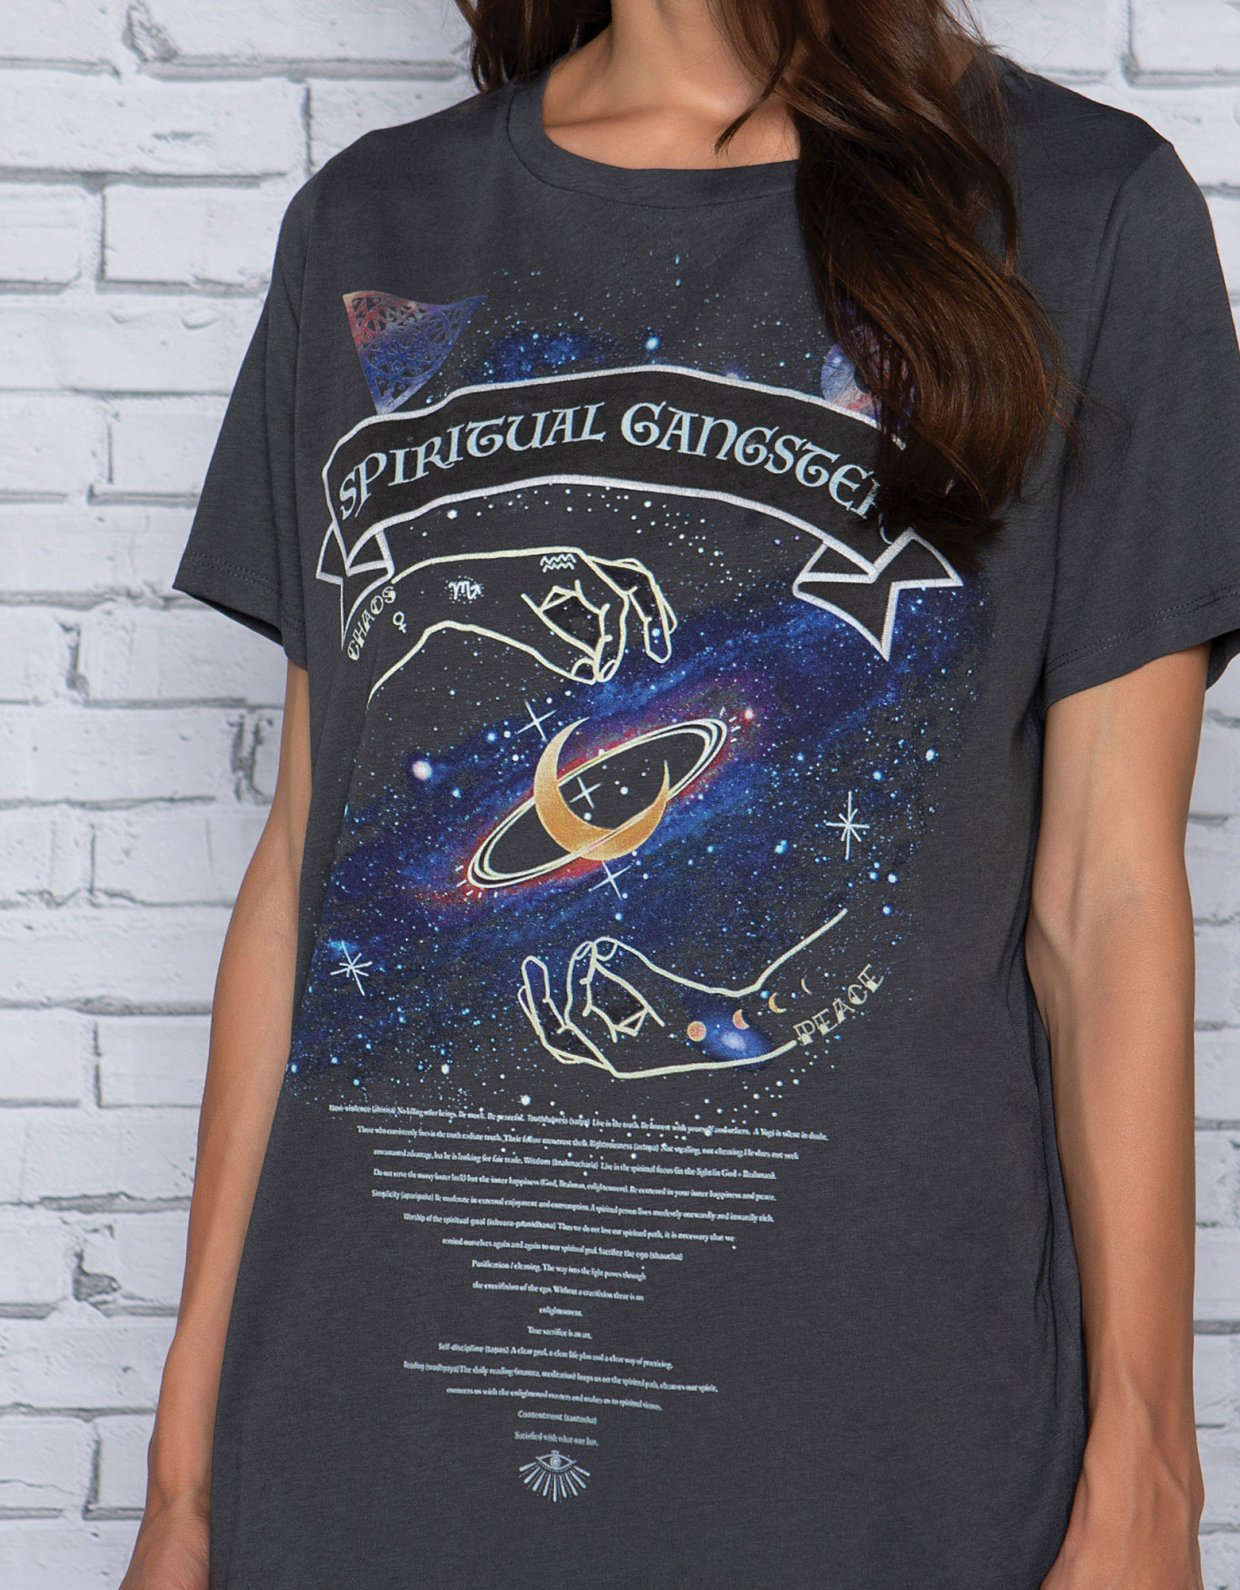 Peace & Chaos Spiritual gangster t-shirt